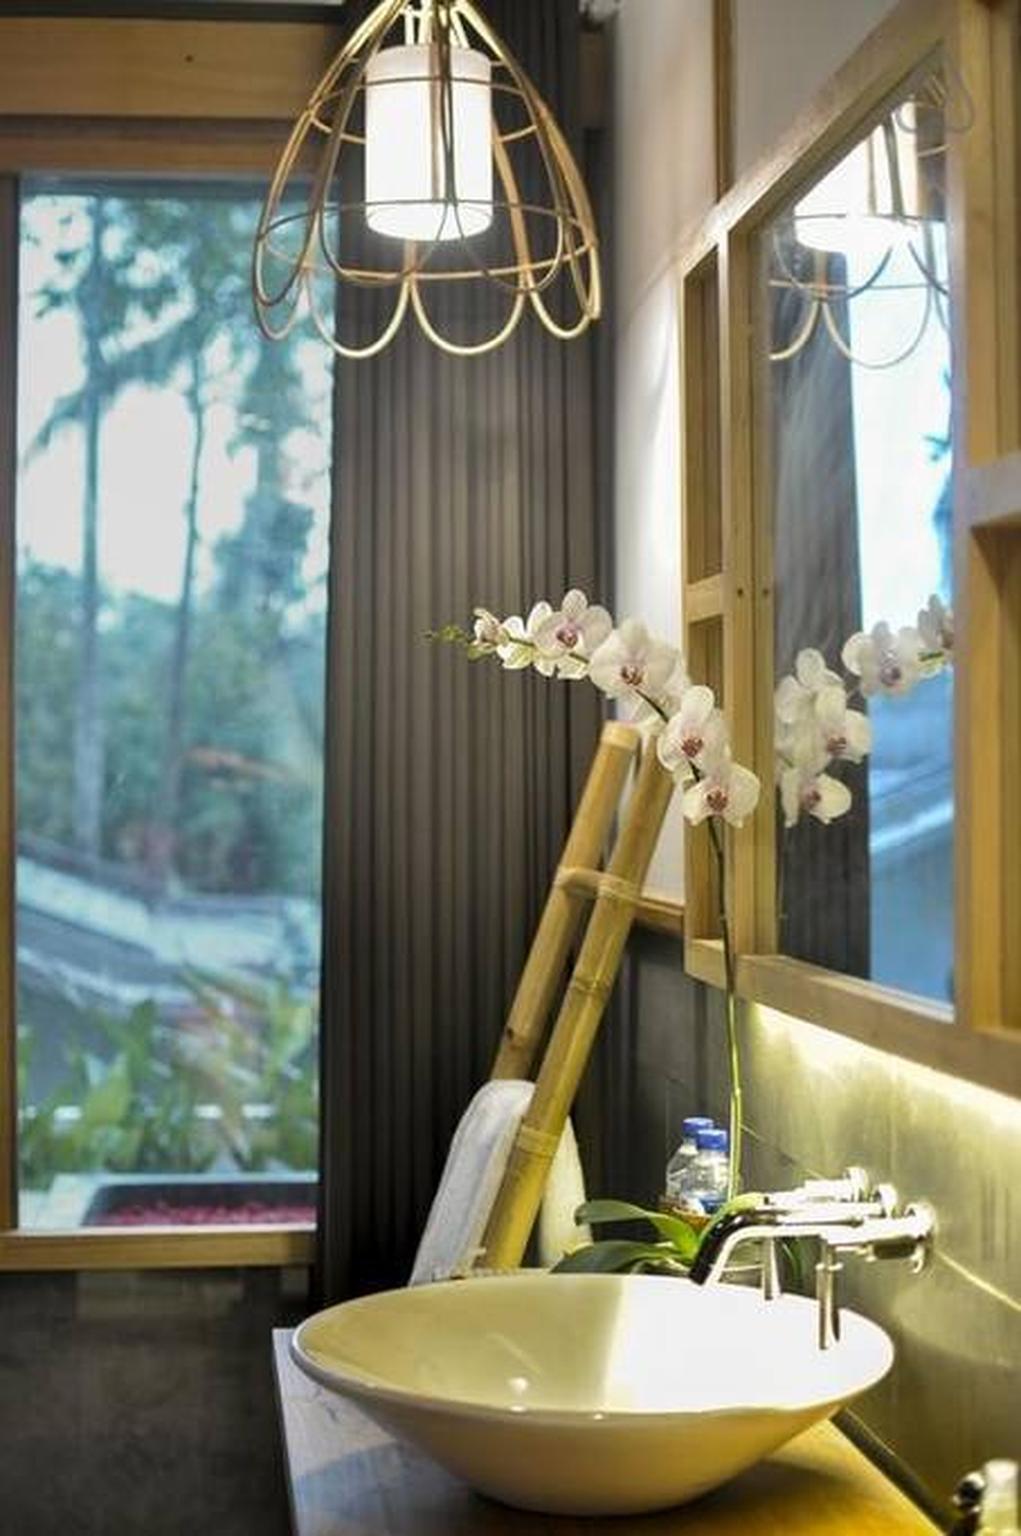 Price 1 BDR Terrace suite Villas at Ubud